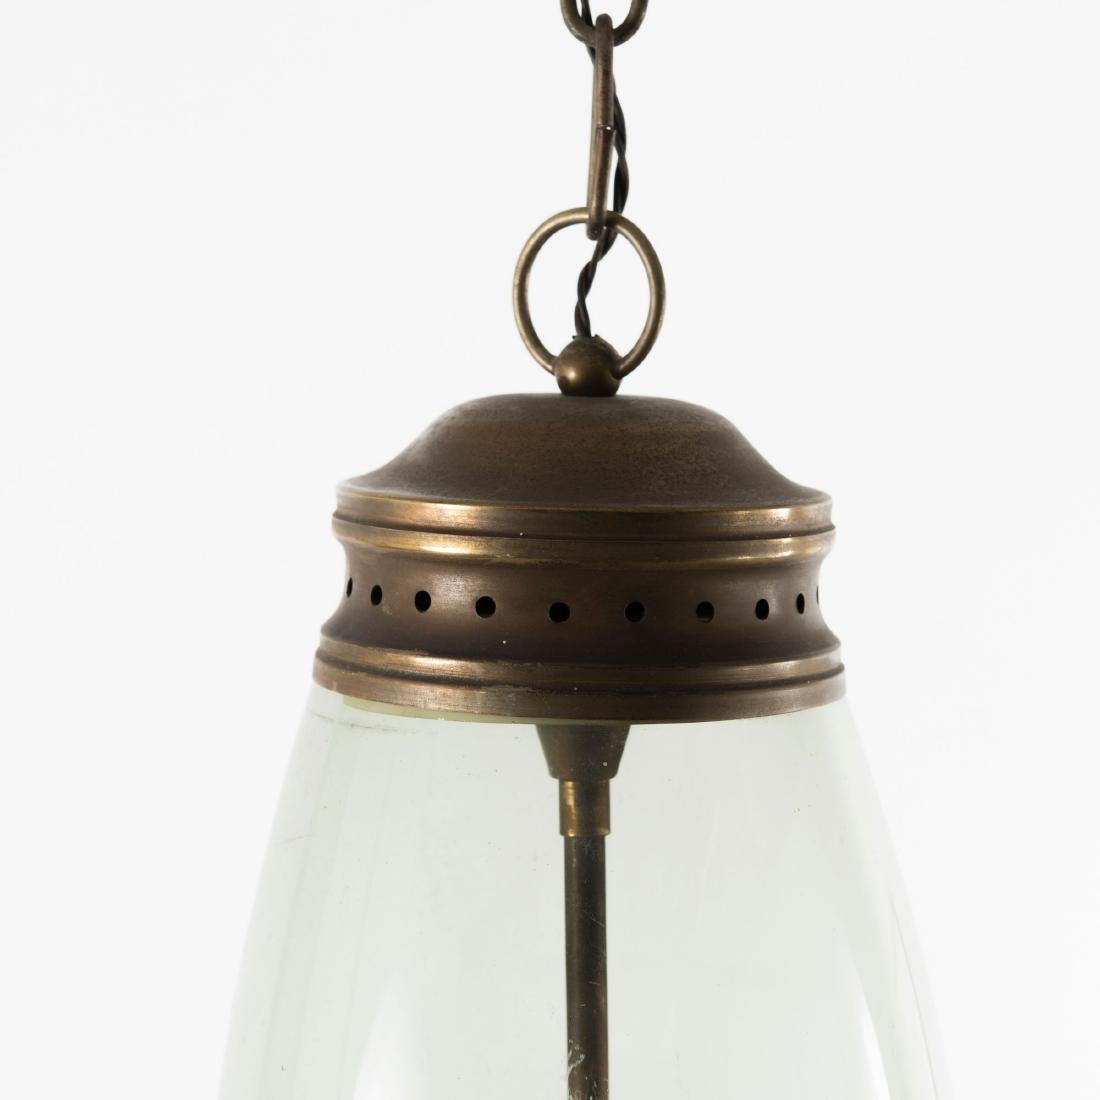 'Laterna' hanging light, 1940/50s - 4